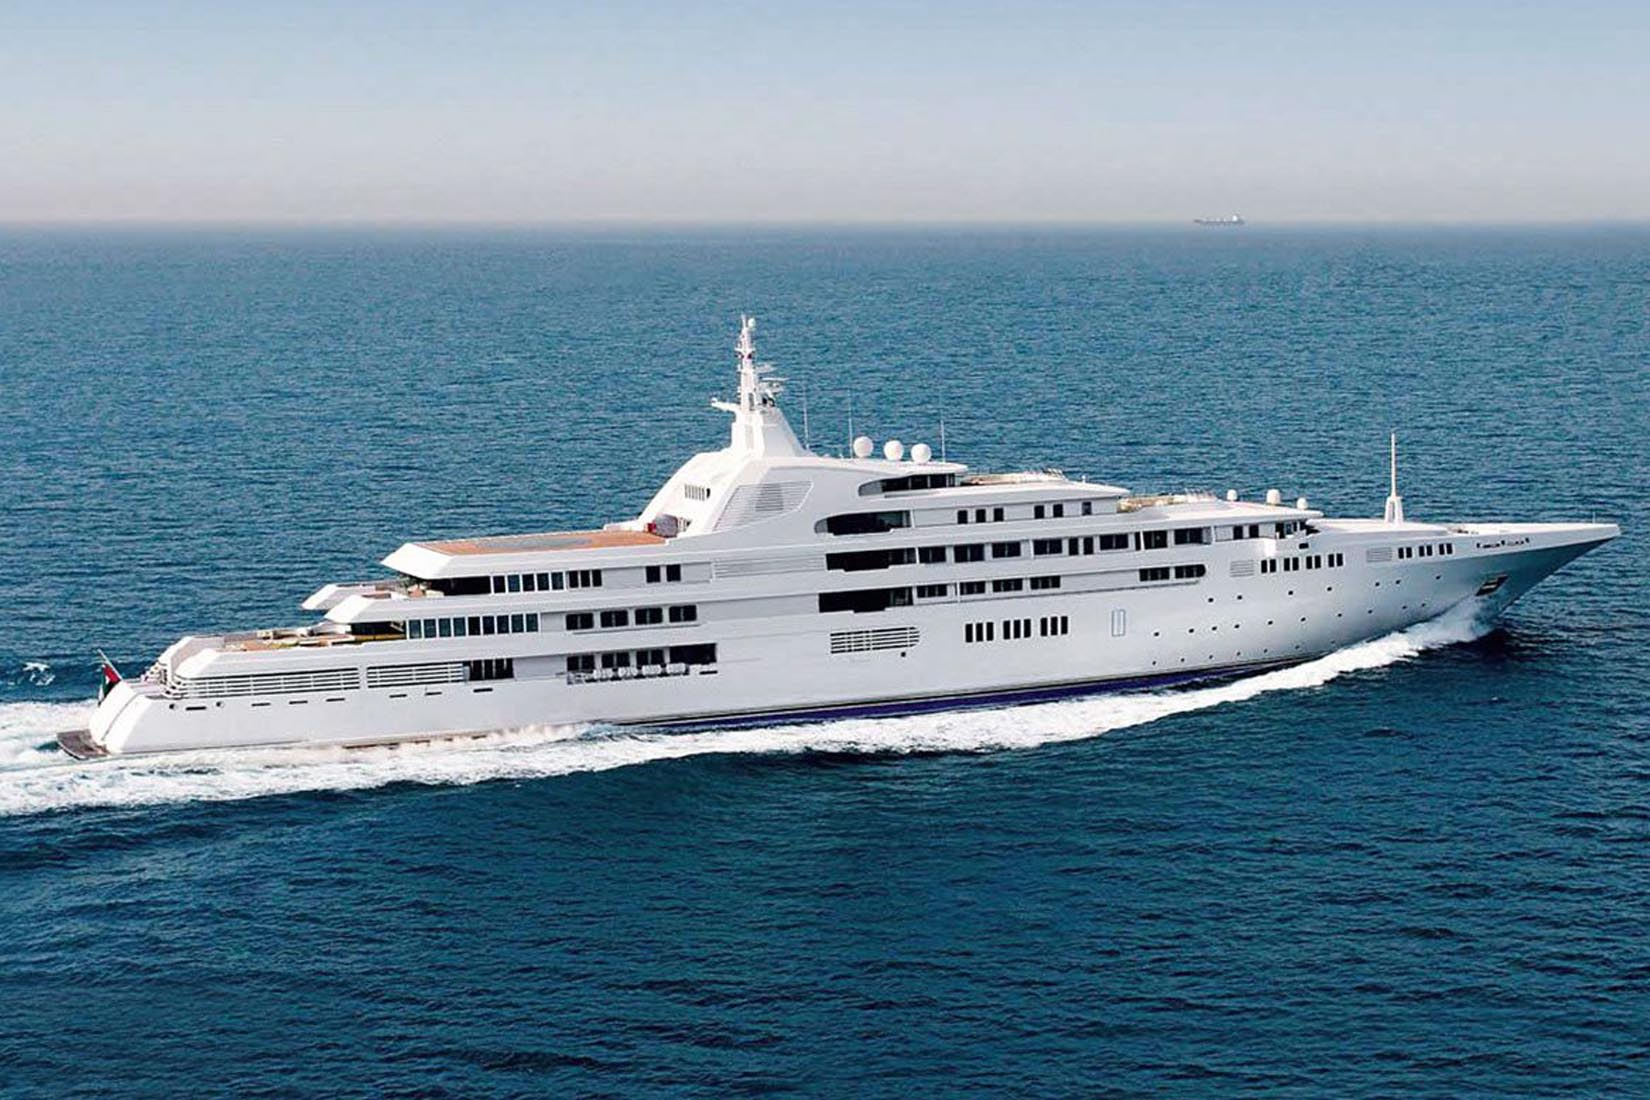 largest yacht dubai review Luxe Digital